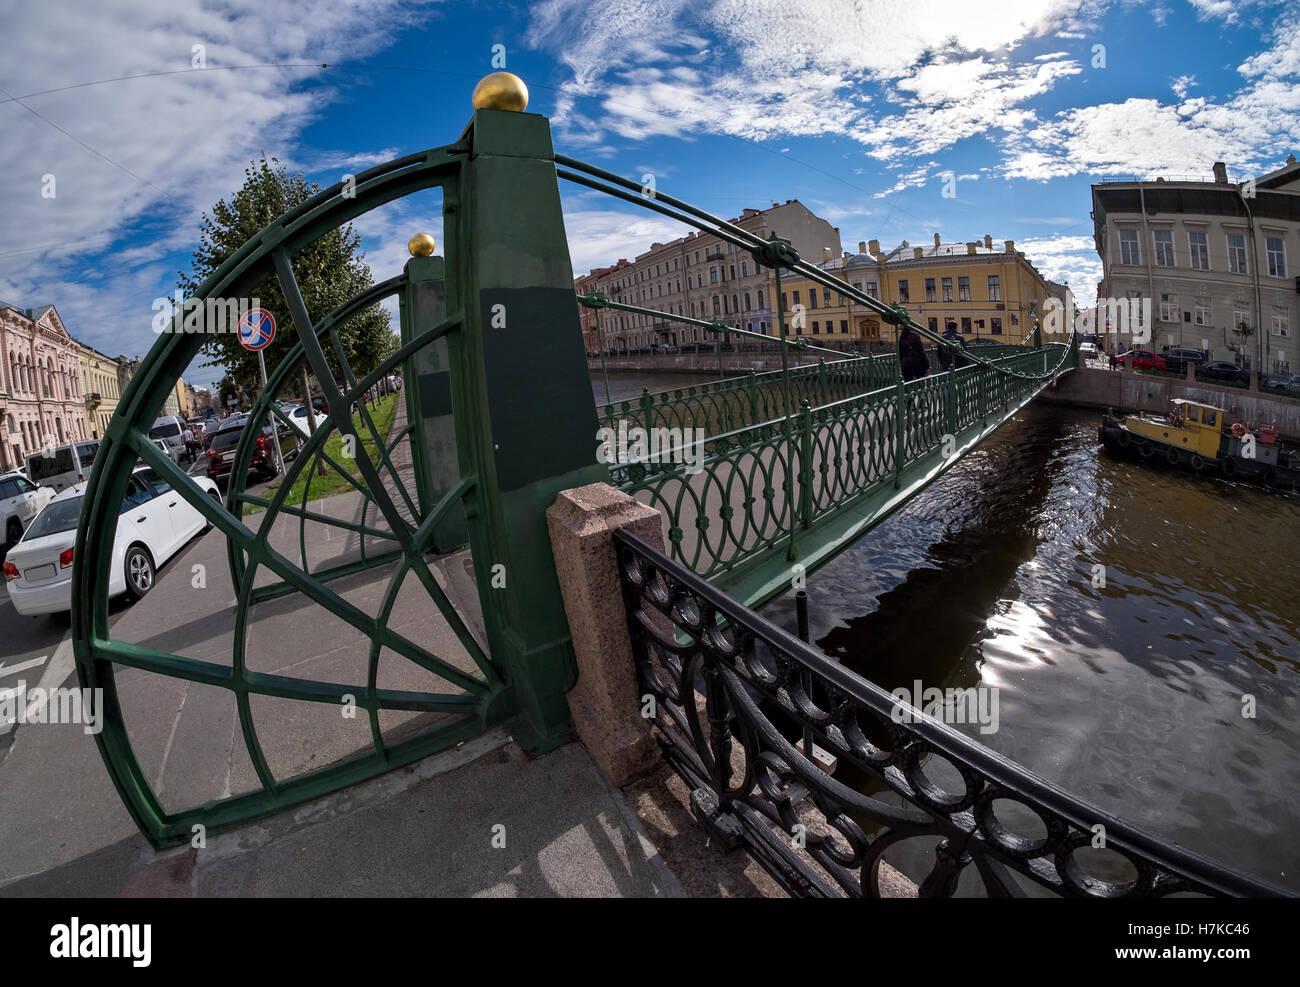 Postoffice bridge in Saint-Petersburg, Russia - Stock Image